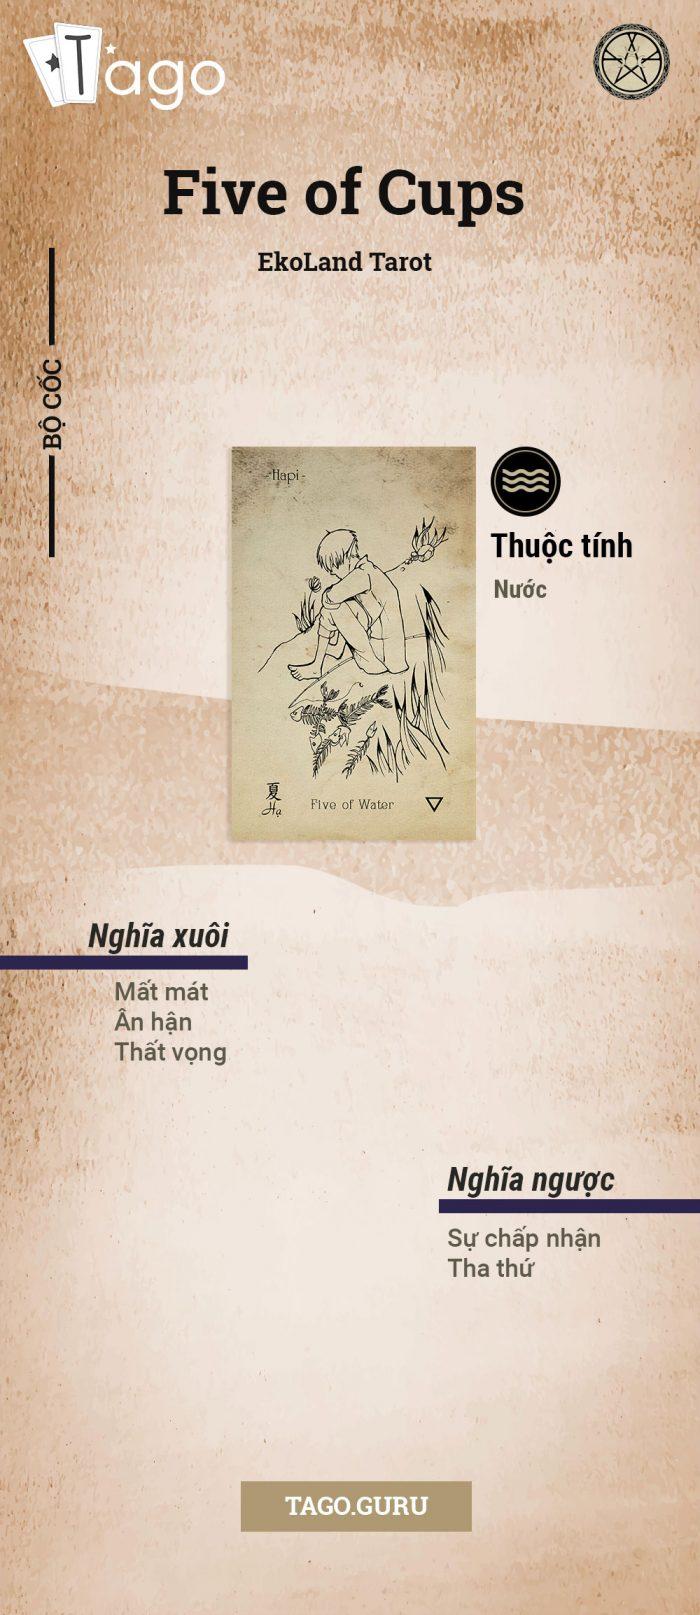 TAGO-Info-Bai-Tarot-Five-of-cups